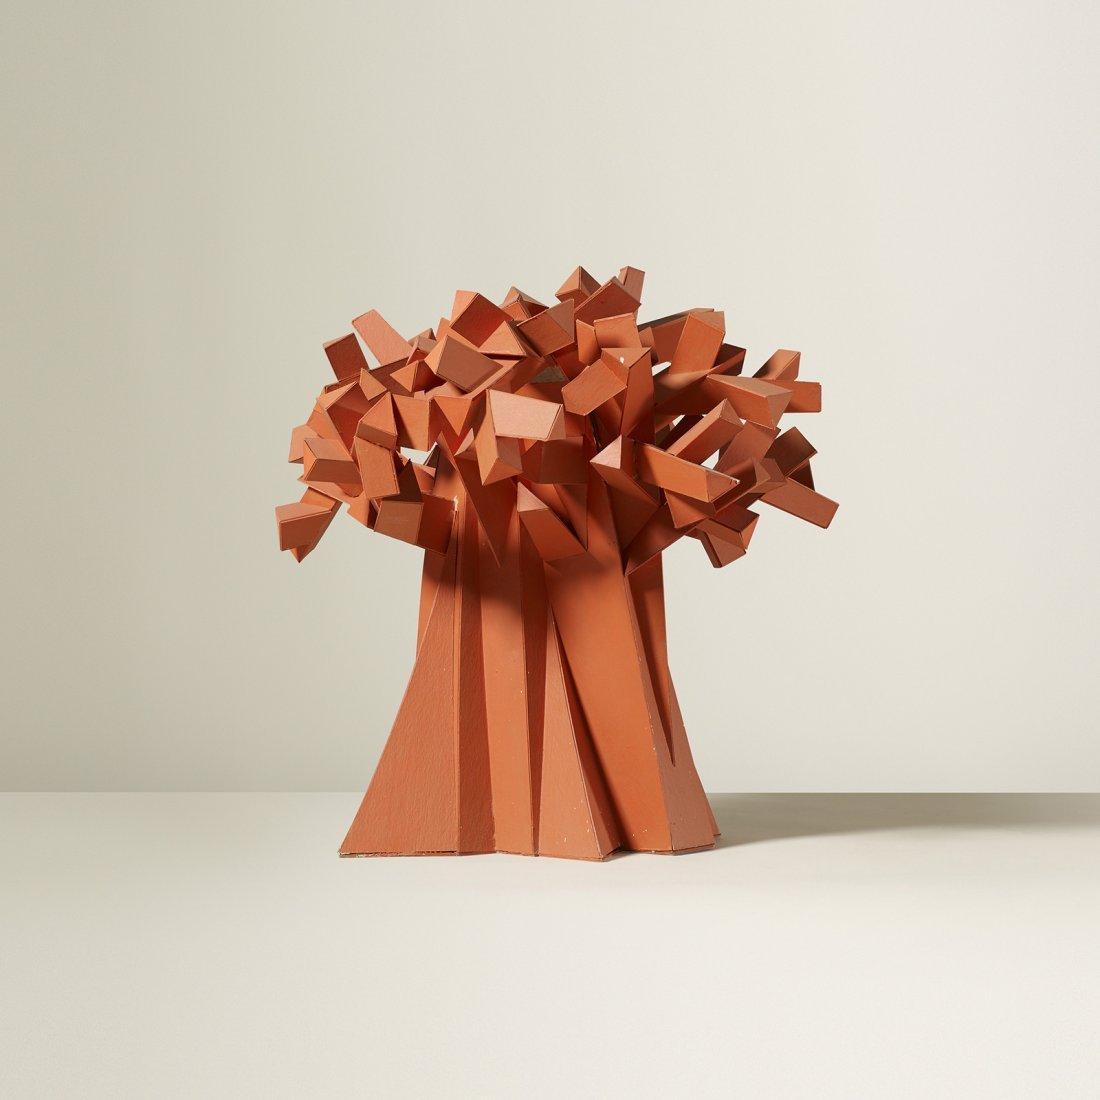 Irving Harper Untitled (Tree)